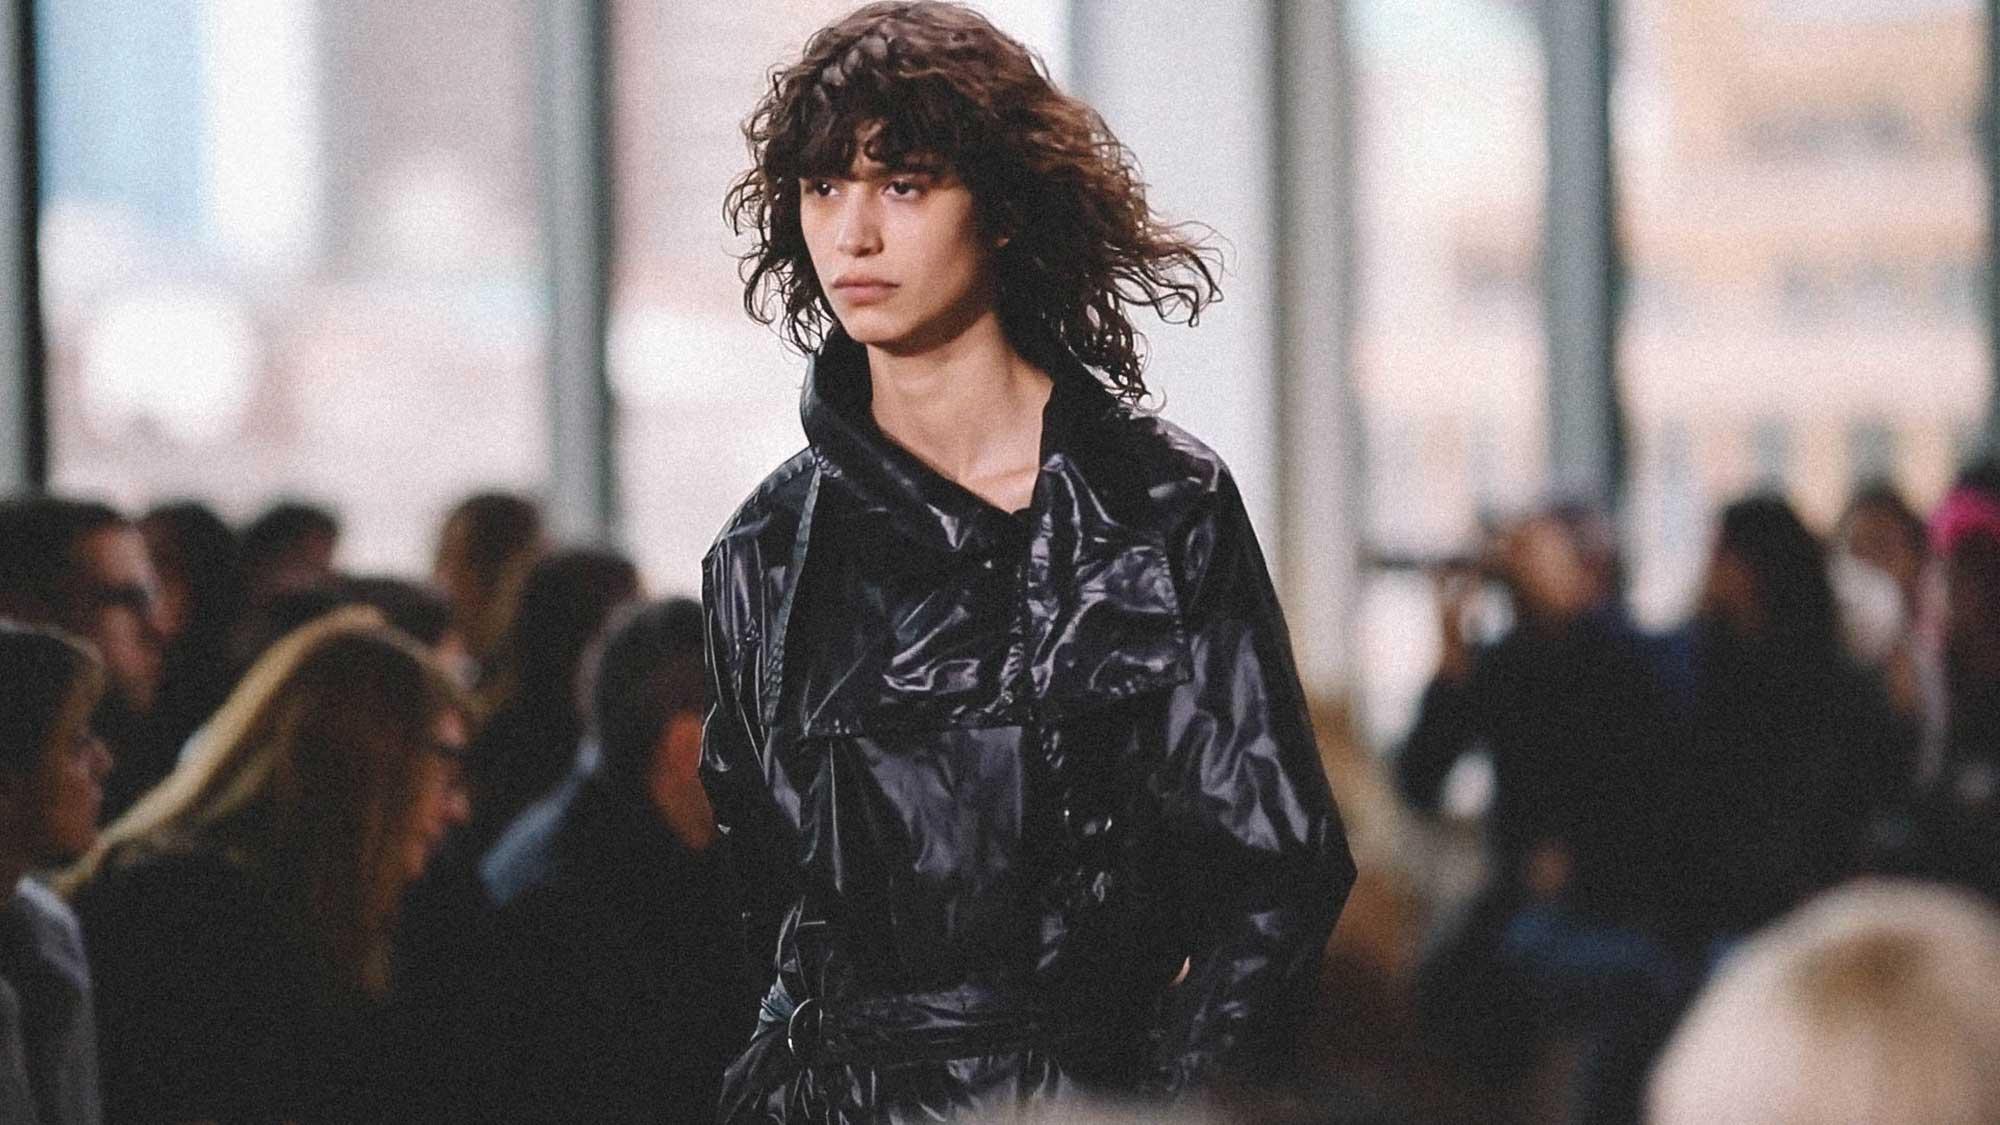 Lacoste-Runway-Show-New-York-Fashion-Week-1.jpg